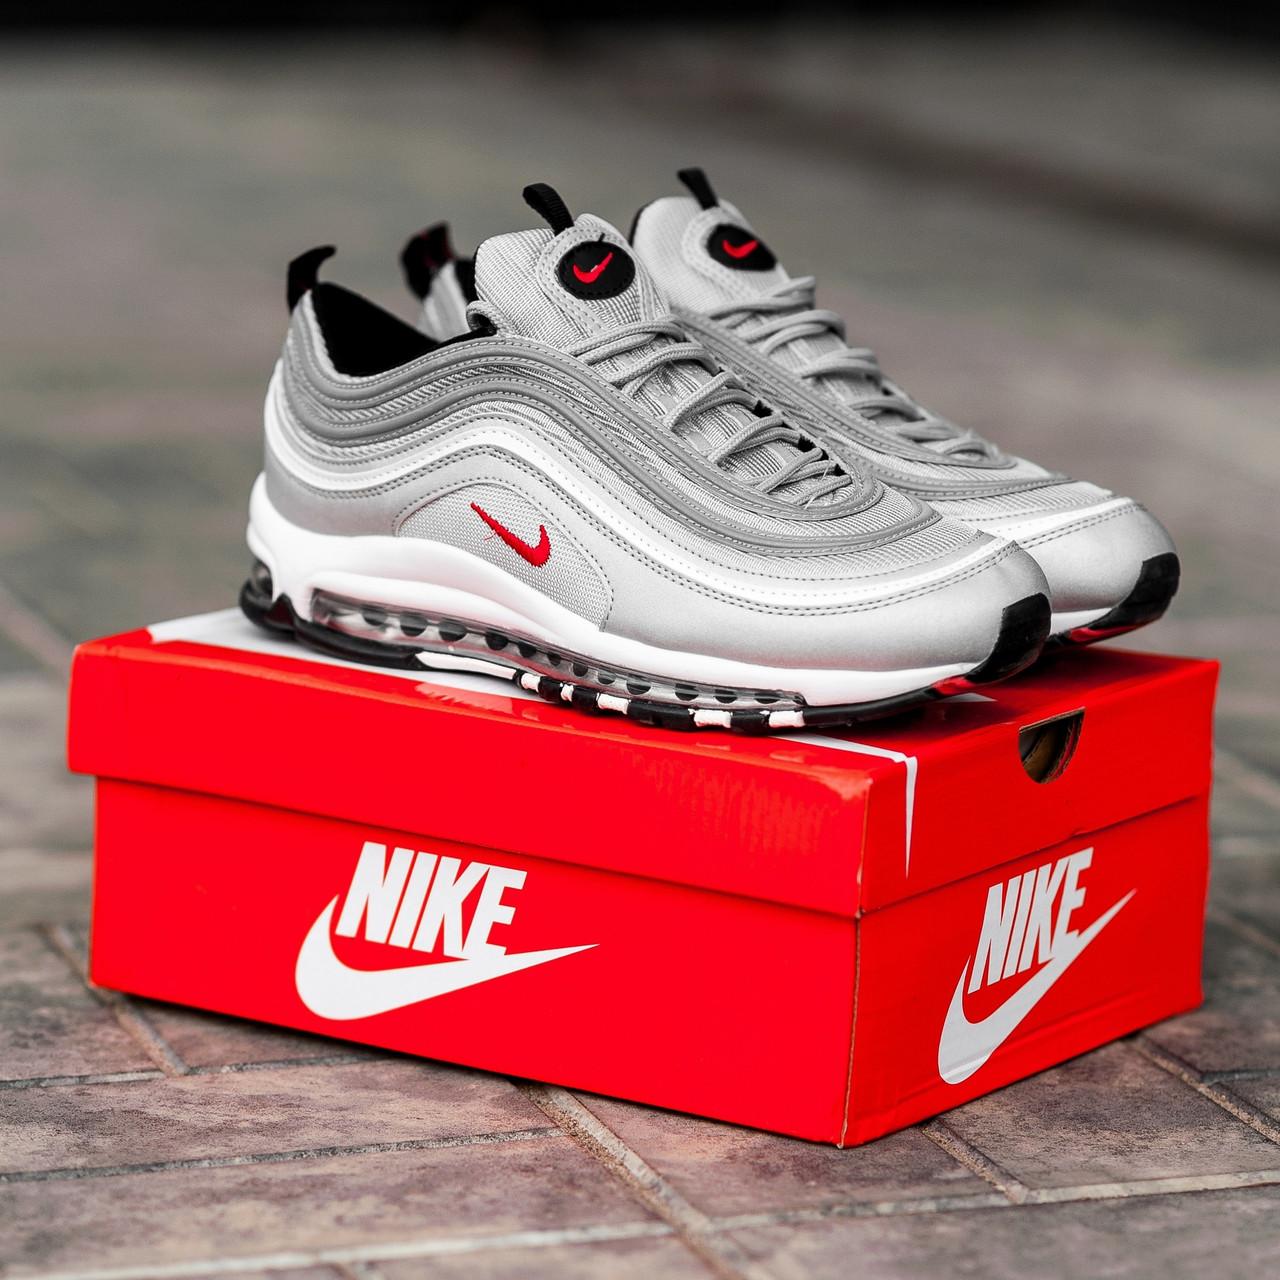 d619903b Мужские кроссовки Nike Air Max 97 Grey - Интернет магазин